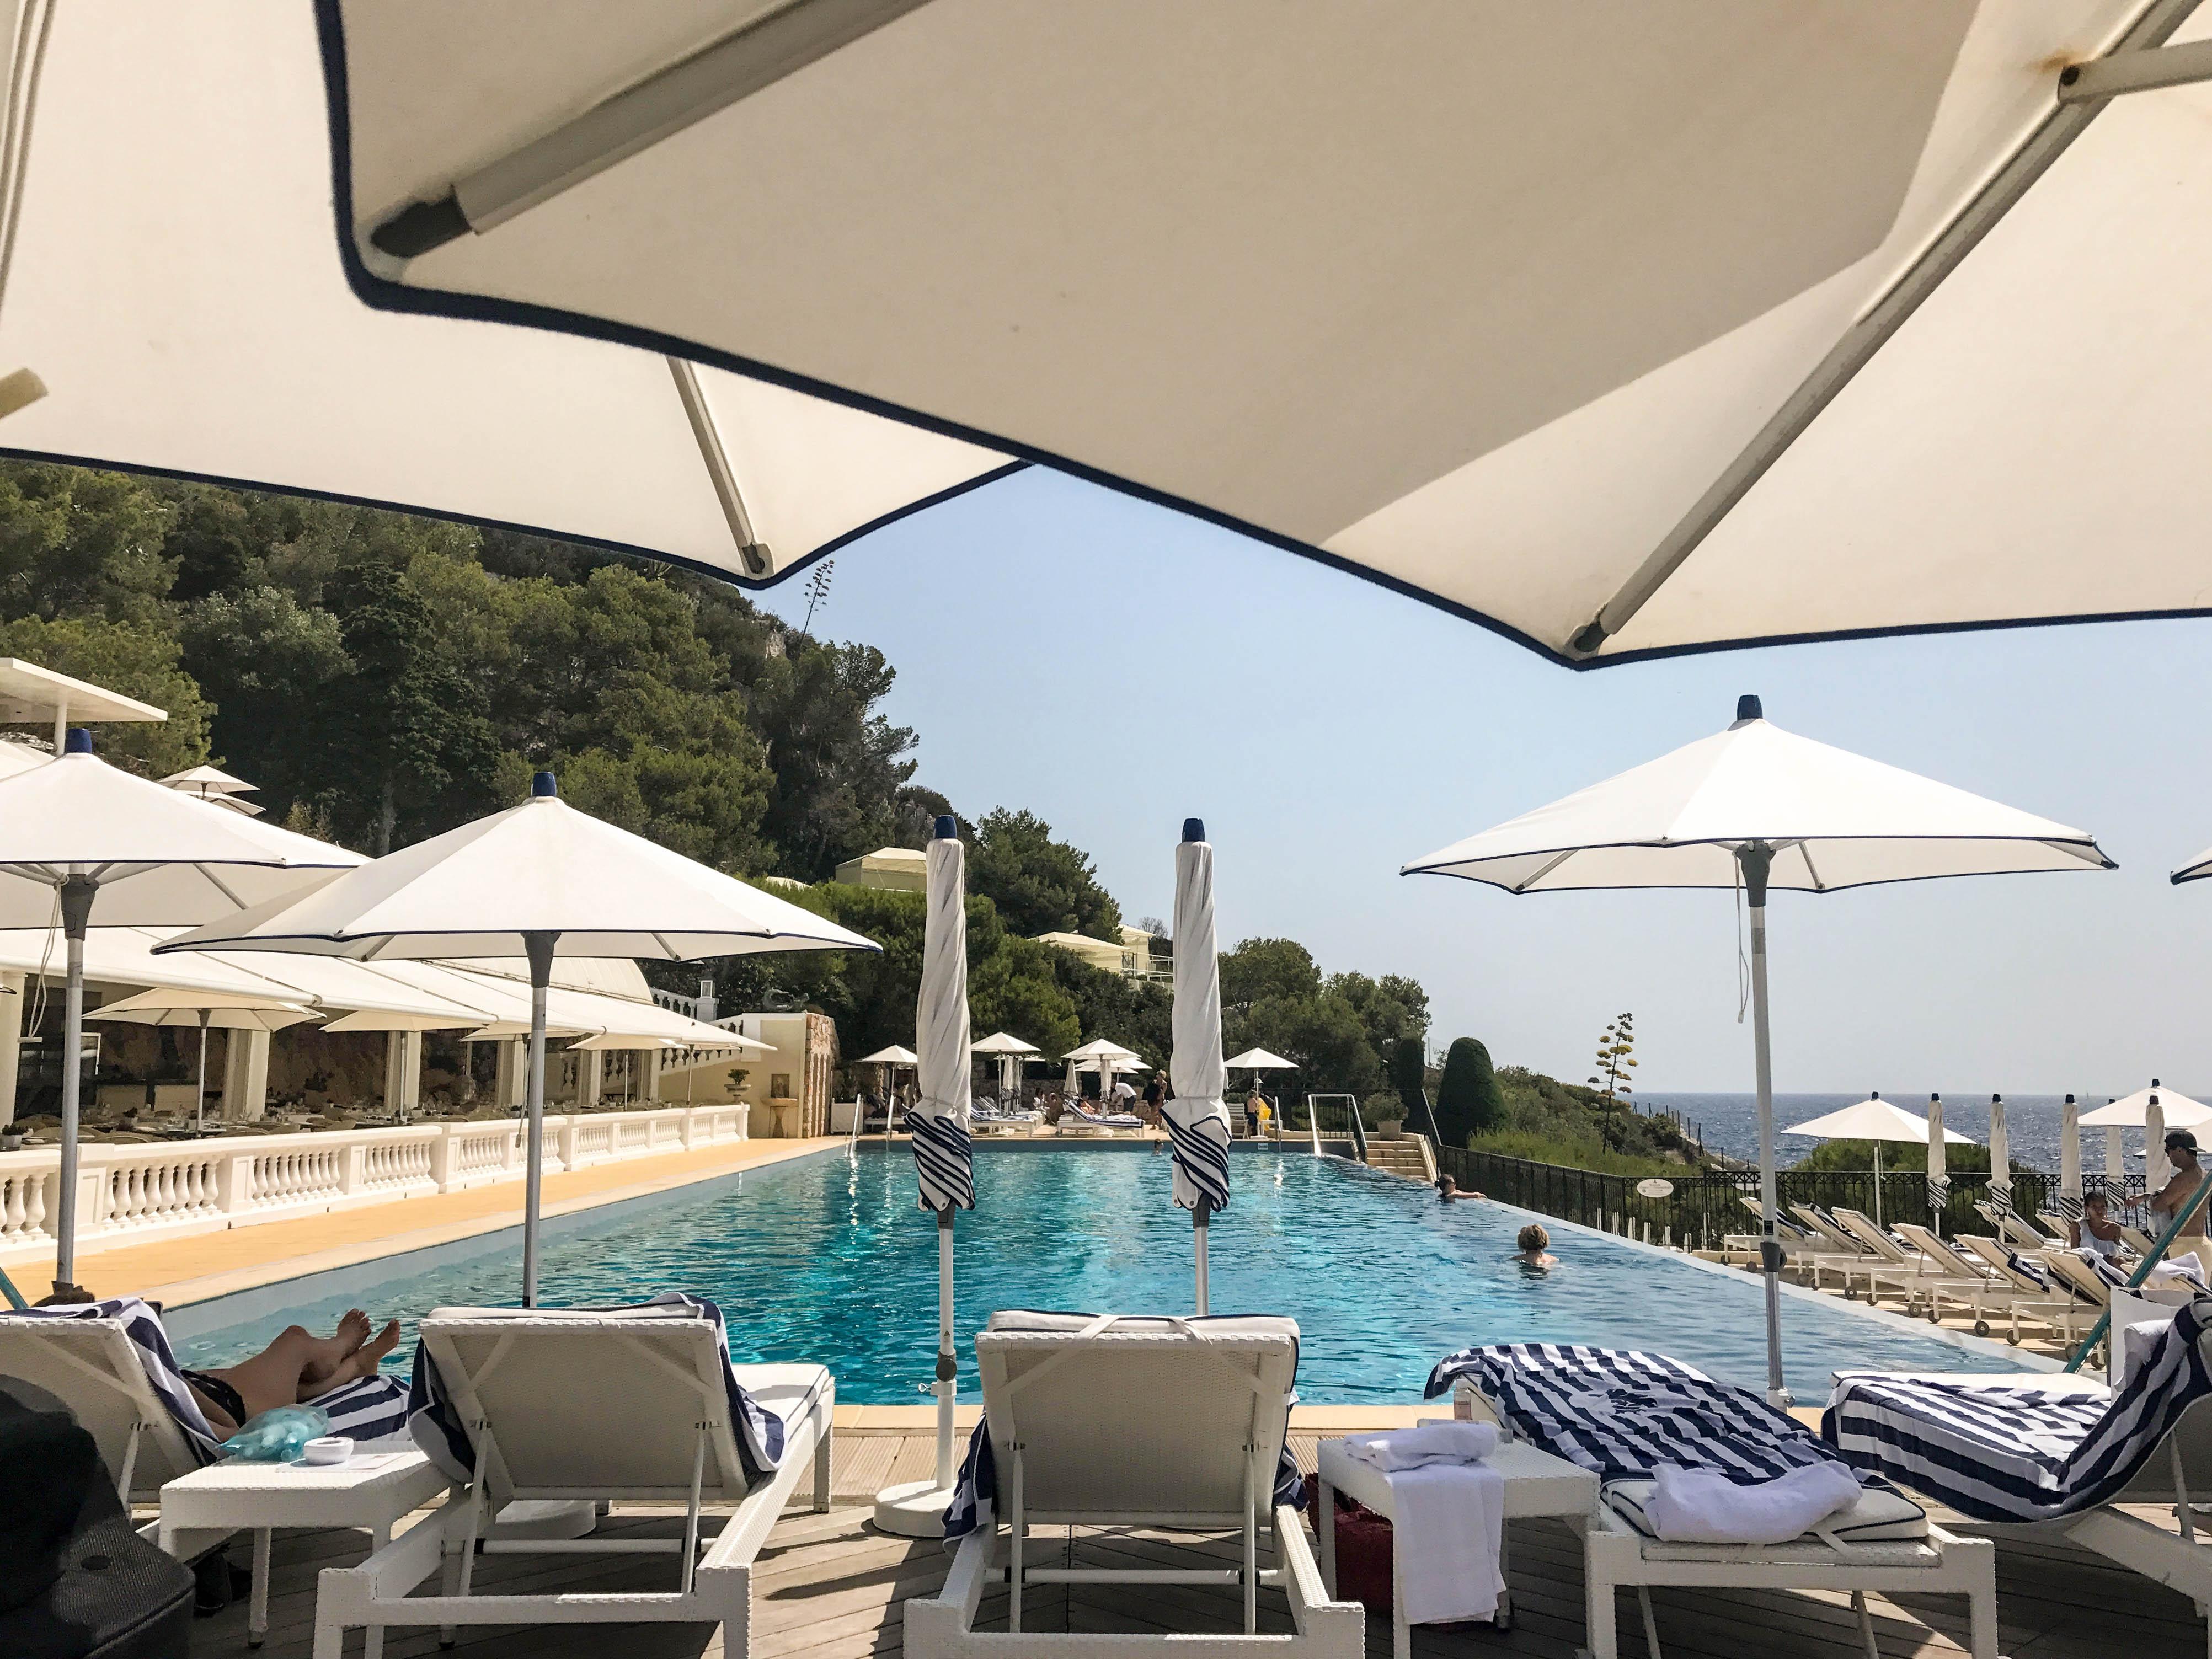 Pool Day In Cap Ferrat